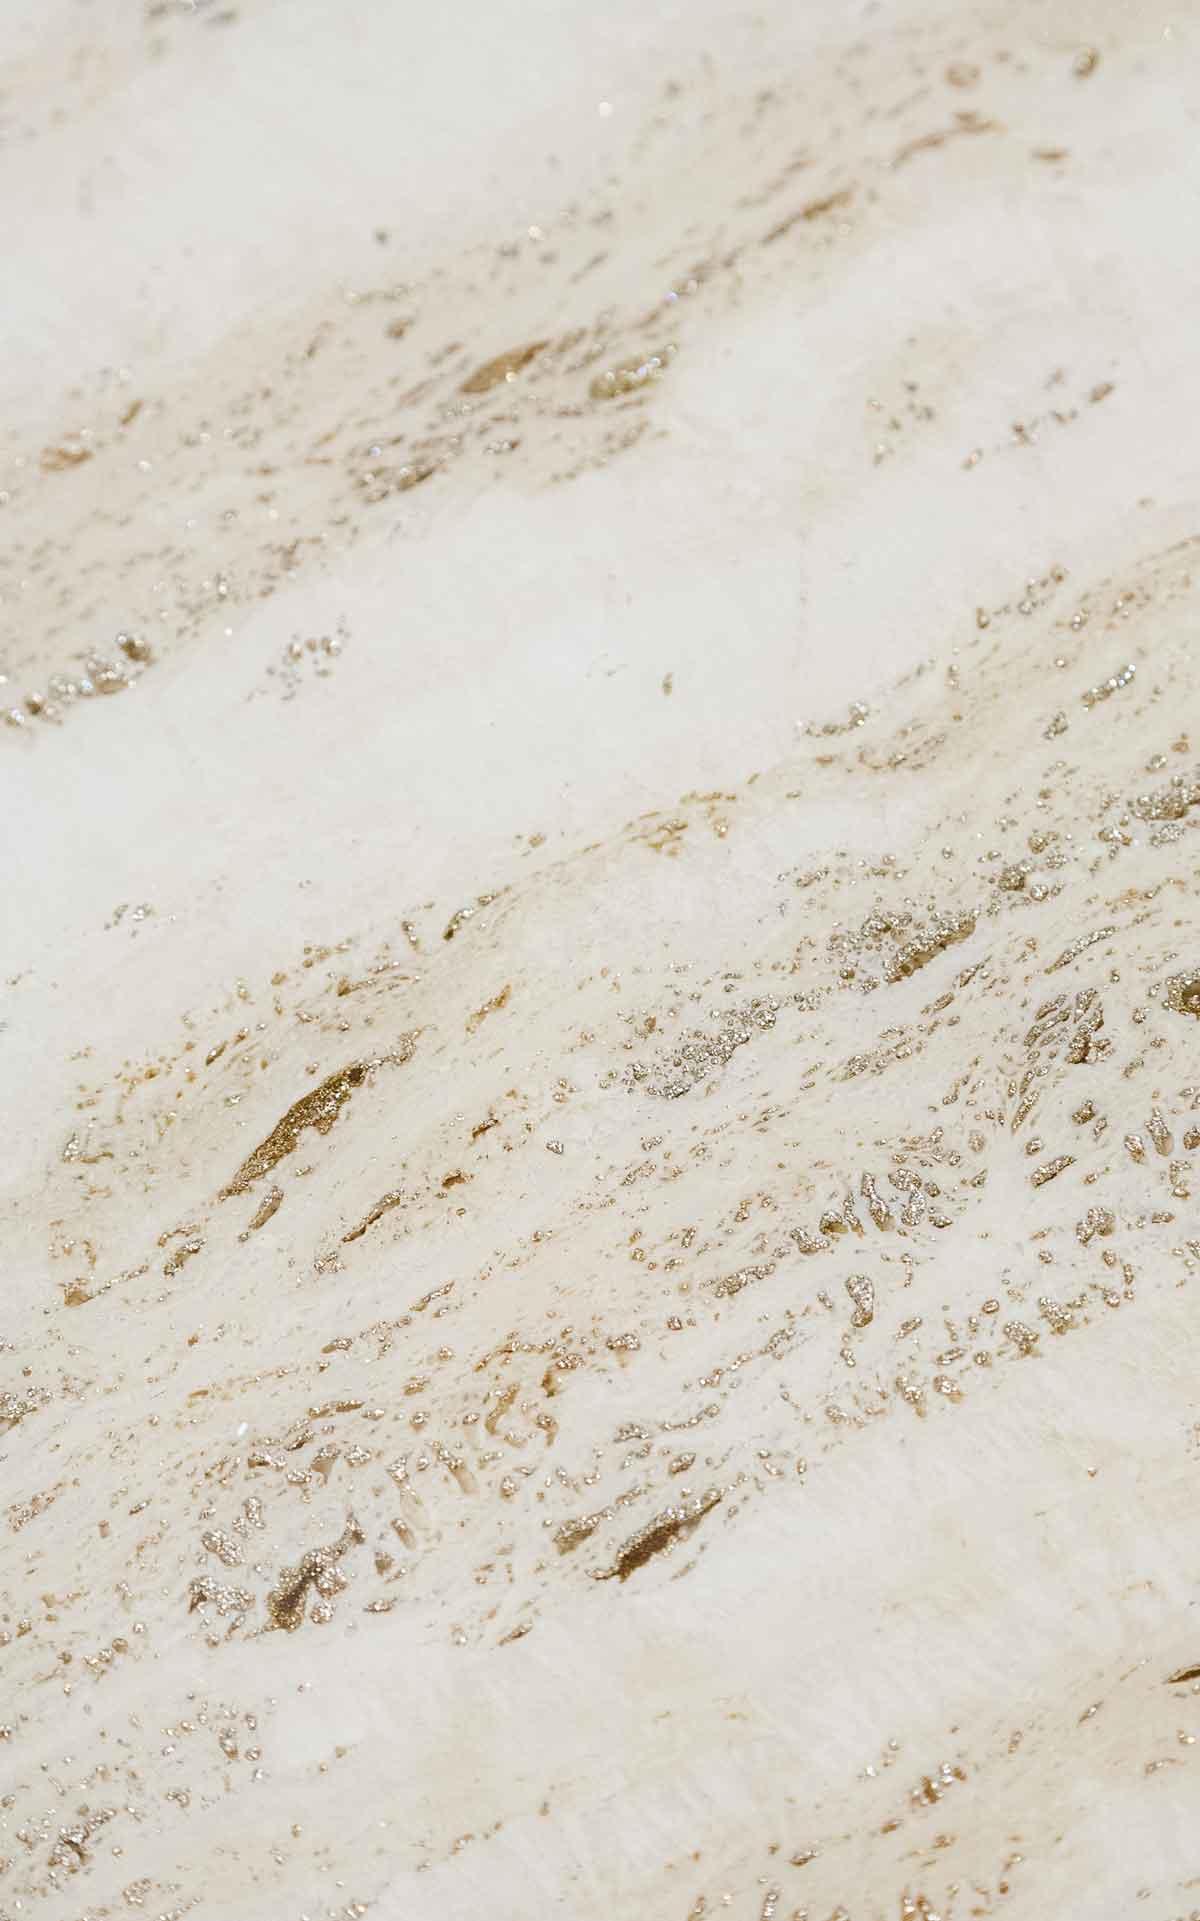 Naldi pavimenti, Materiali, Marmo bianco